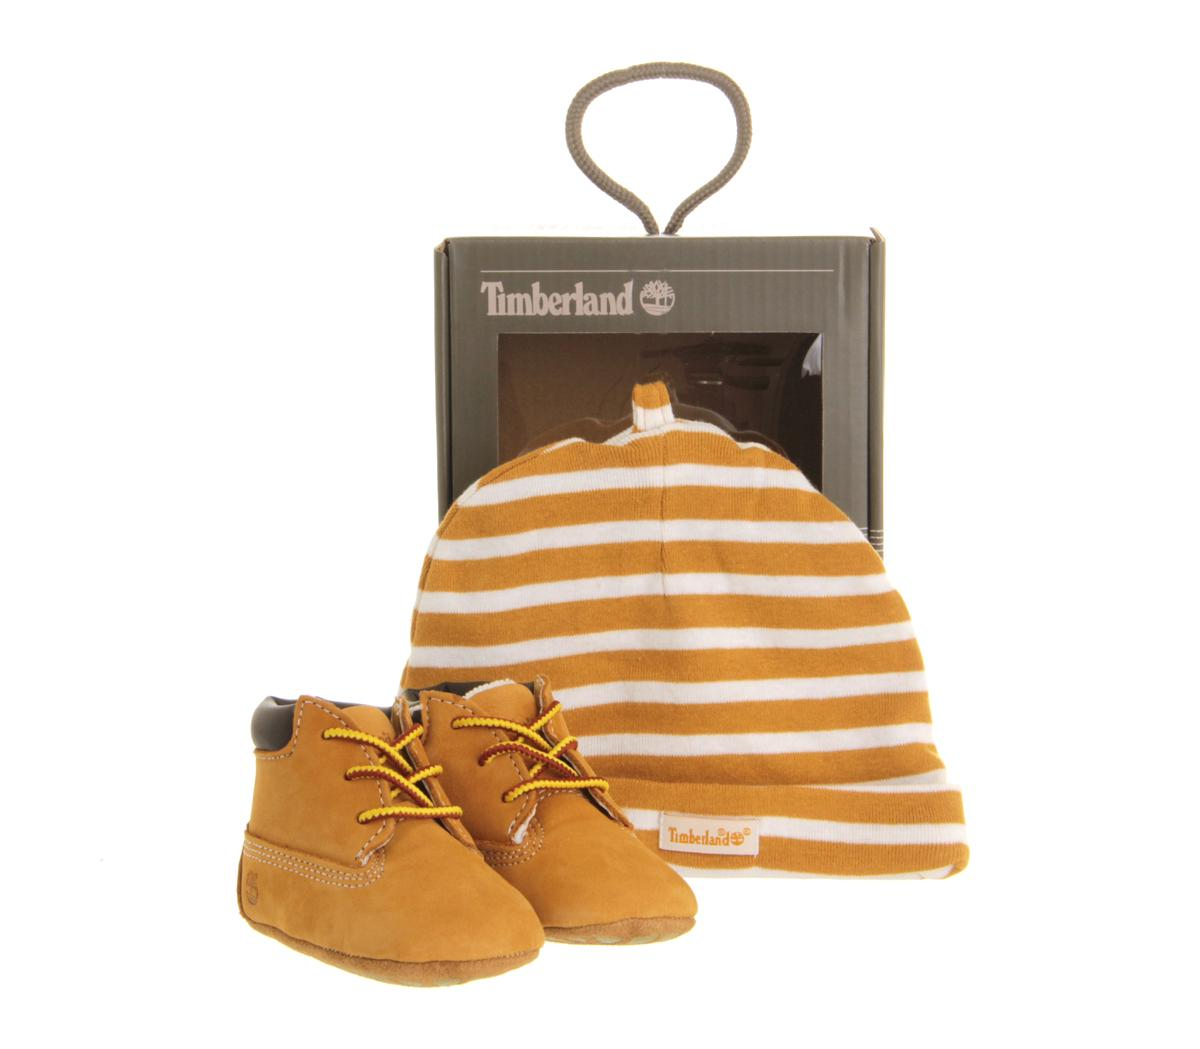 TIMBERLAND 6INCH CRIB WHEAT COMES W SKULL CAP NEW BORN CRIB BOOTIES 9589R